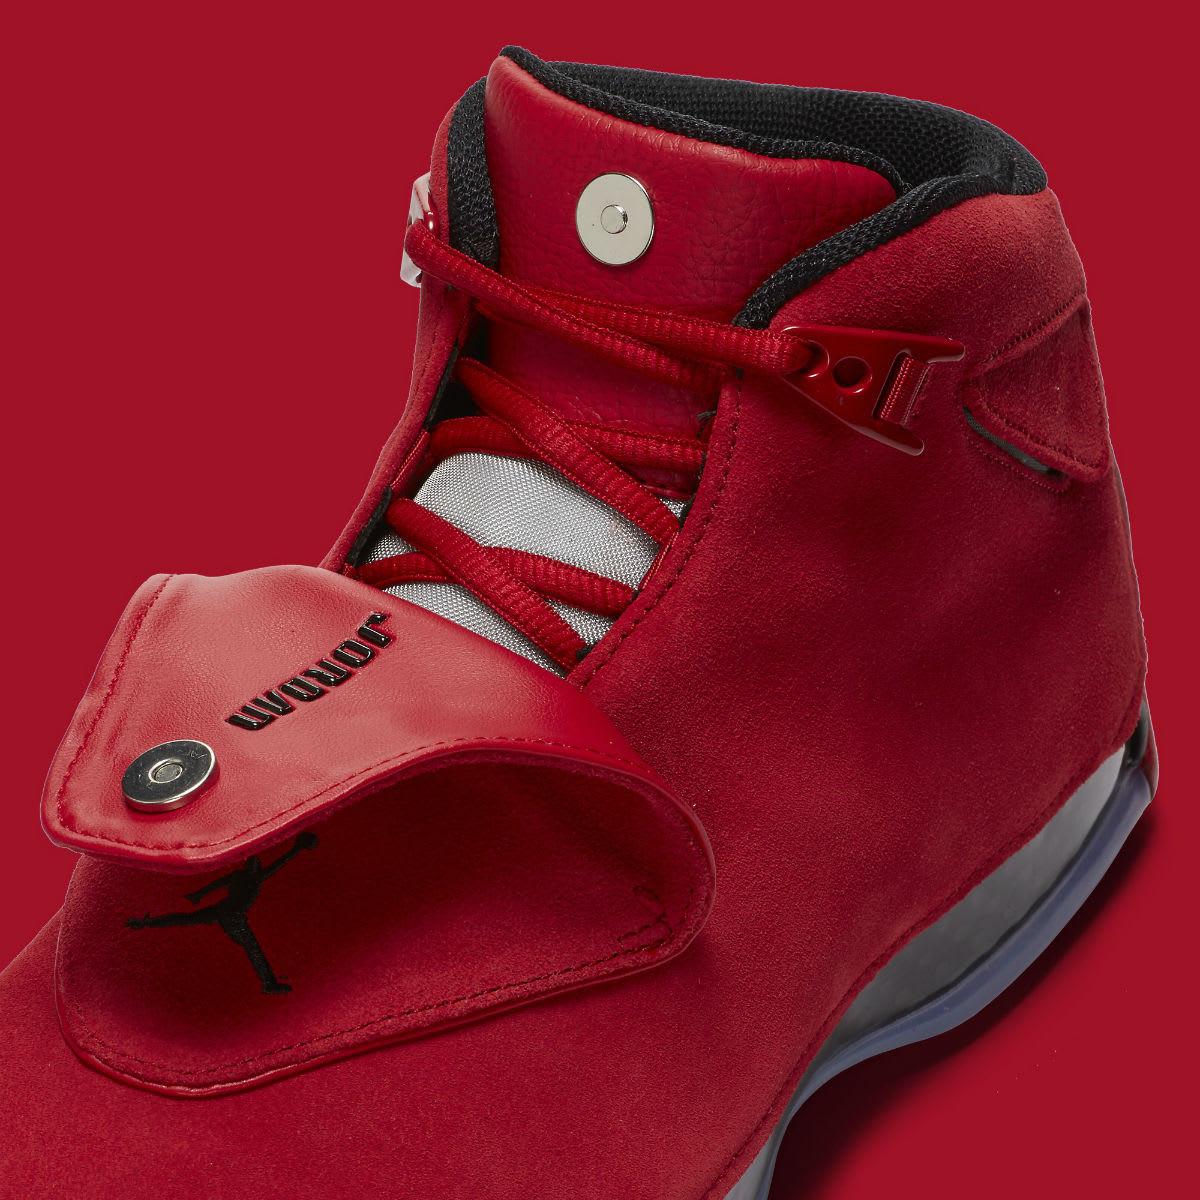 new styles 6f18b 2a349 chaussure air jordan 6 retro pour homme ca